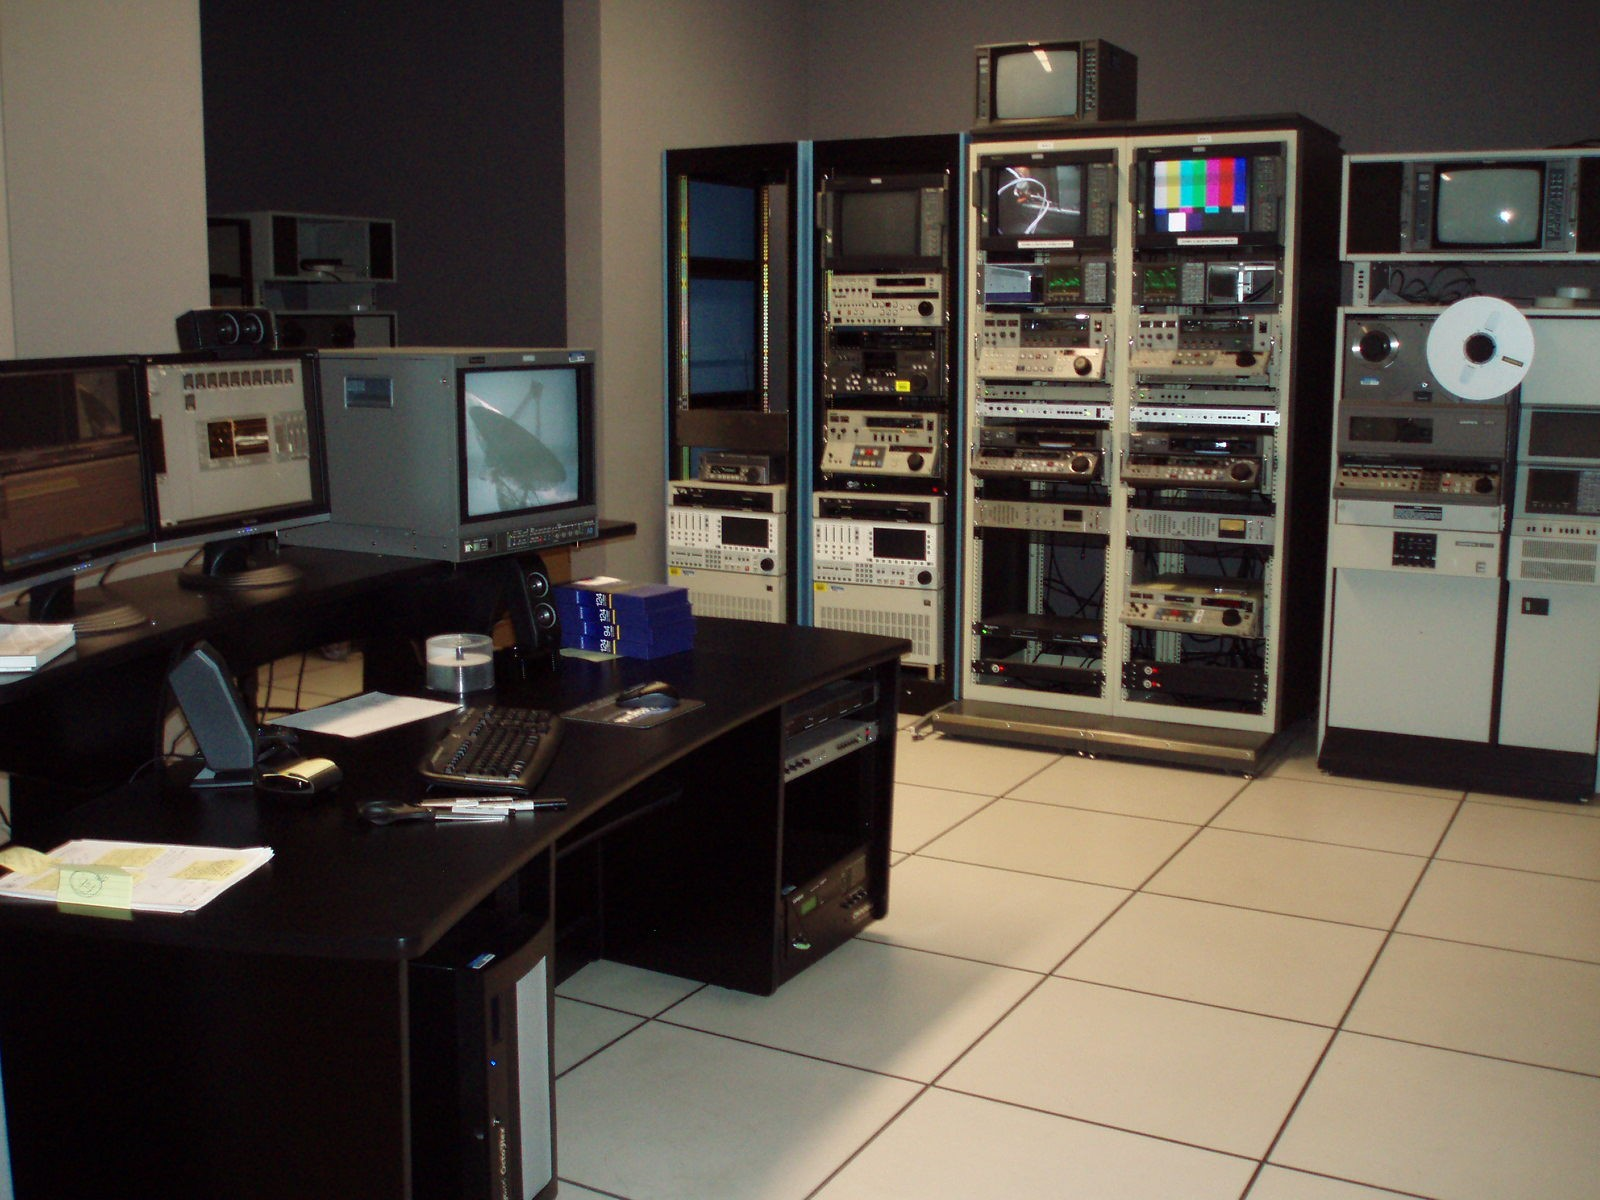 Reformatting equipment in the video lab